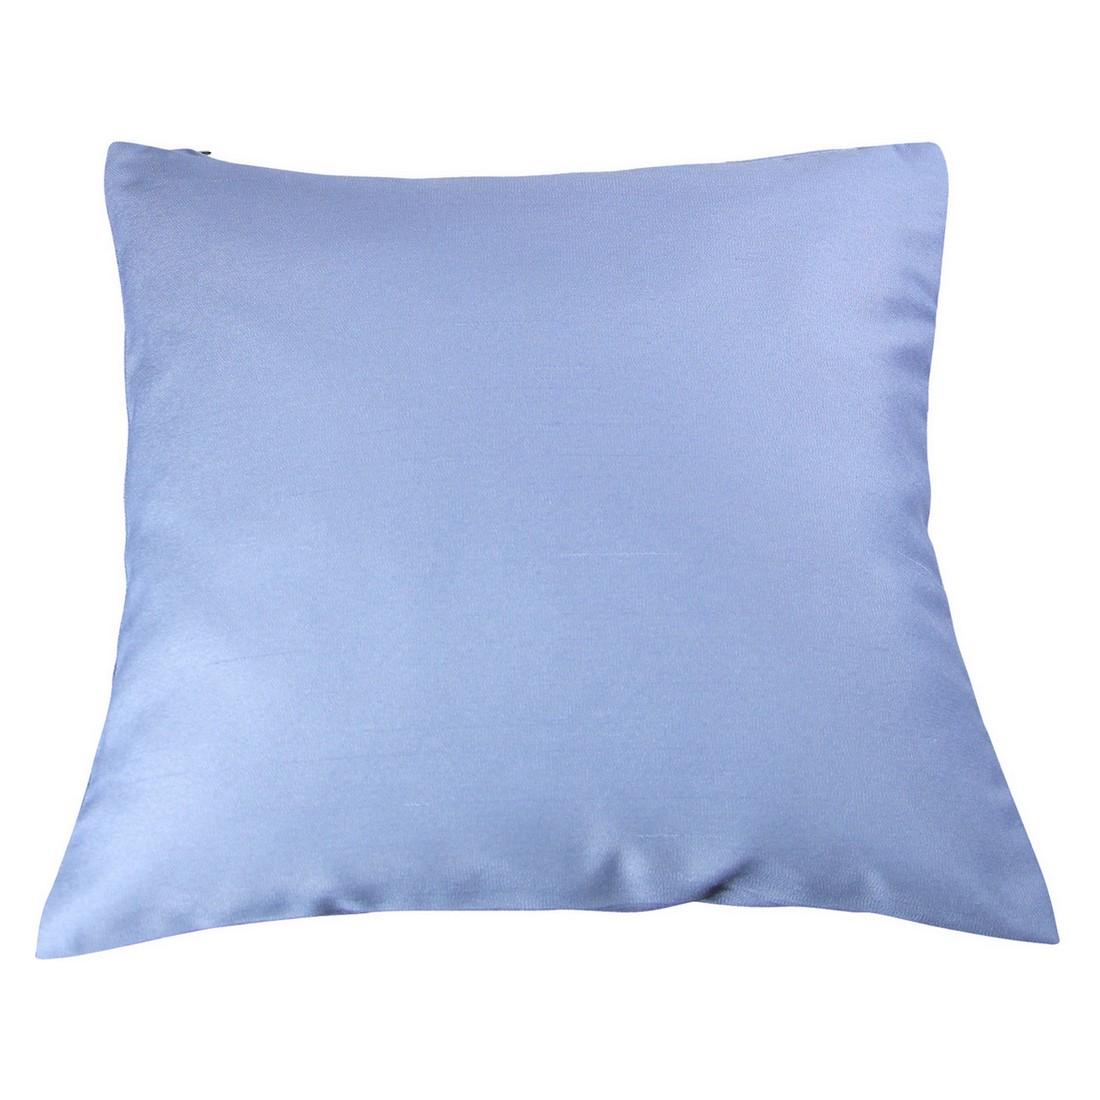 Kissenhülle Nova (2er,4er oder 6er-Set) – Violett – 40 x 40 cm – 2 Kissen, MiBiento Living jetzt bestellen